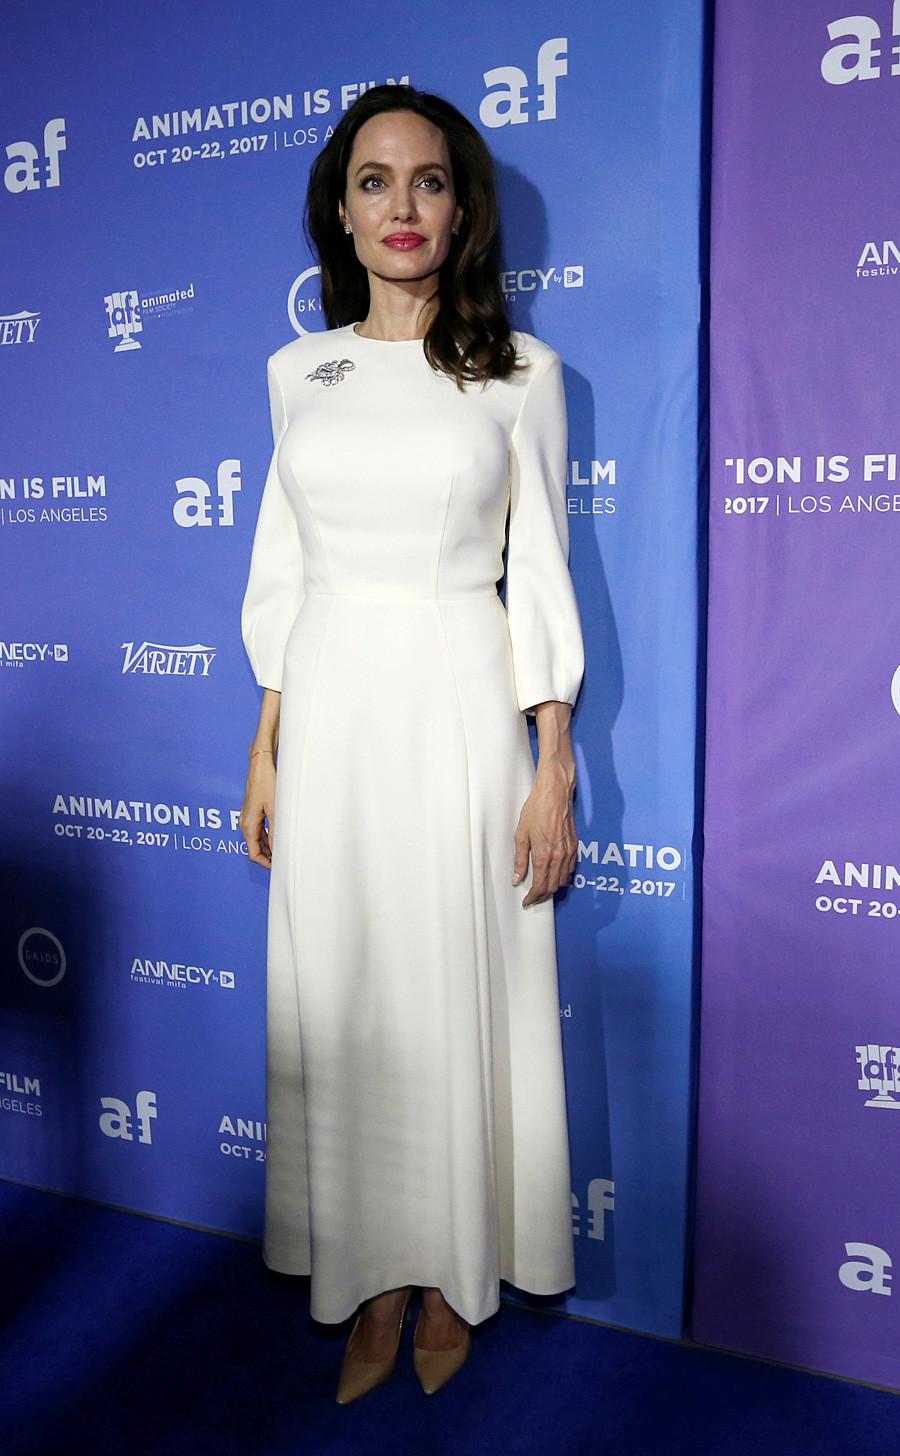 Американската актерка Анџелина Џоли на премиерата на The Breadwinner. 20 октомври 2017, Лос Анџелес, Калифорнија, САД.